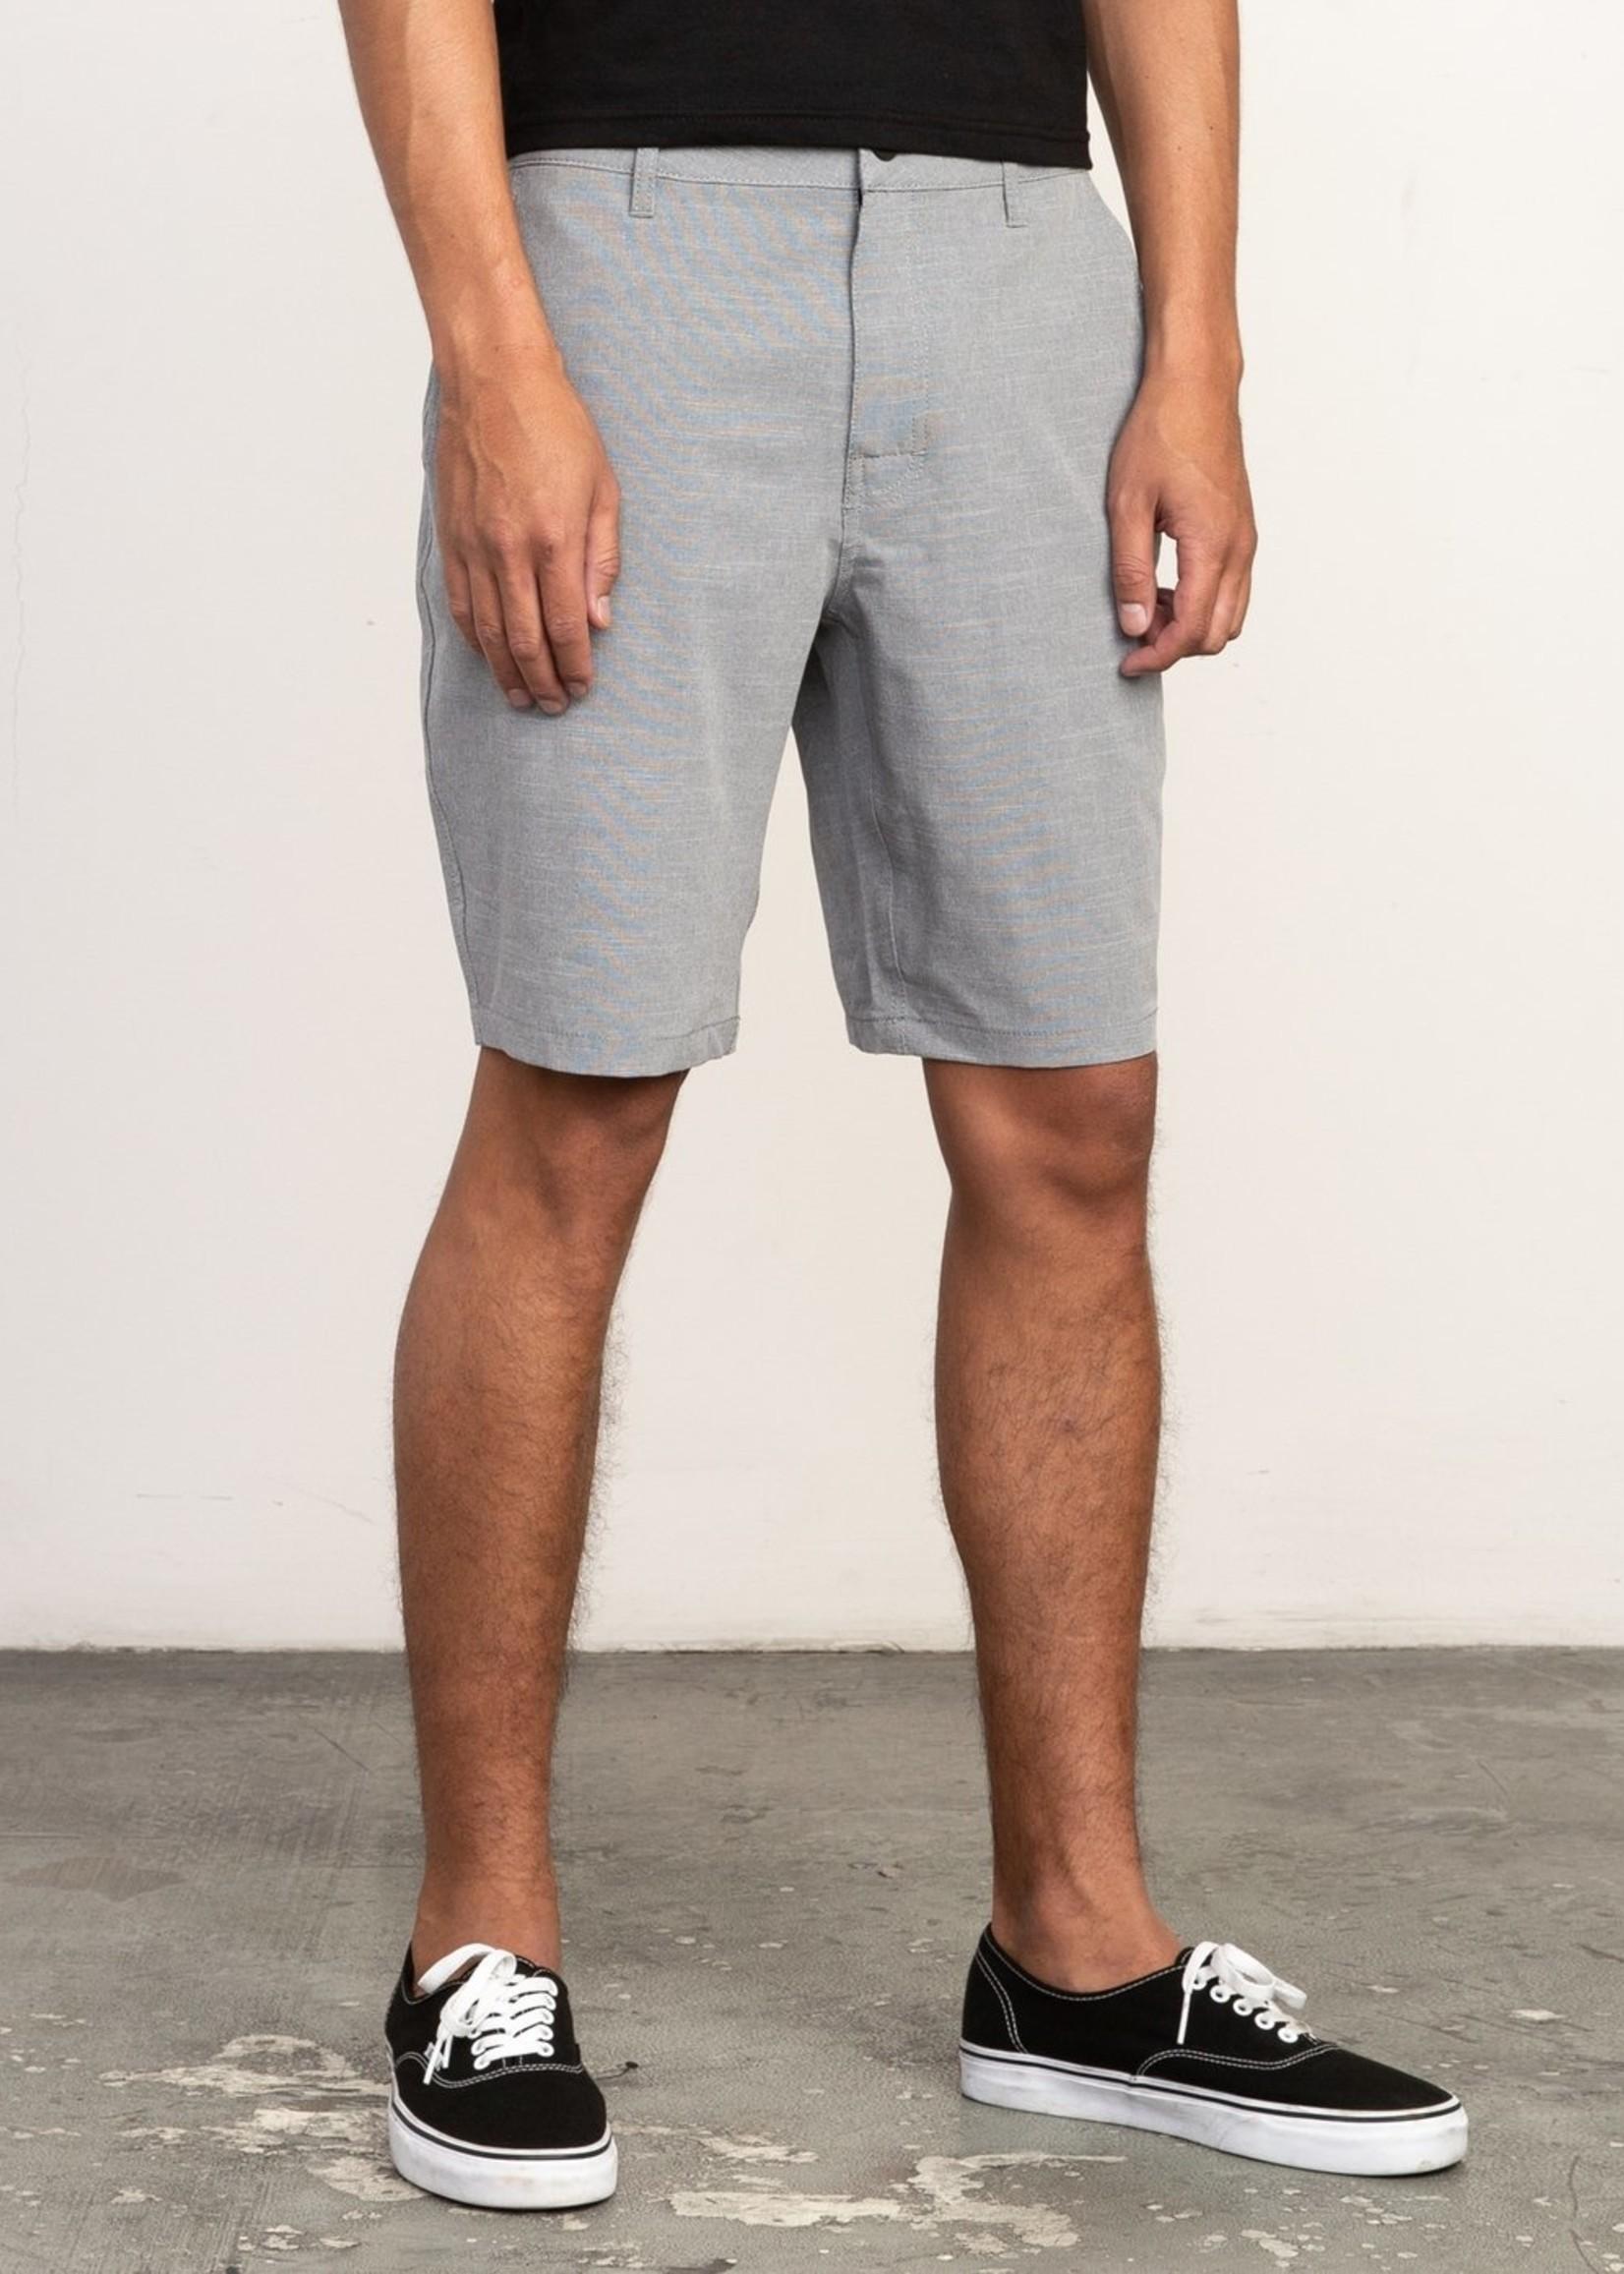 RVCA Balance Hybrid Shorts, ALSO IN KHAKI